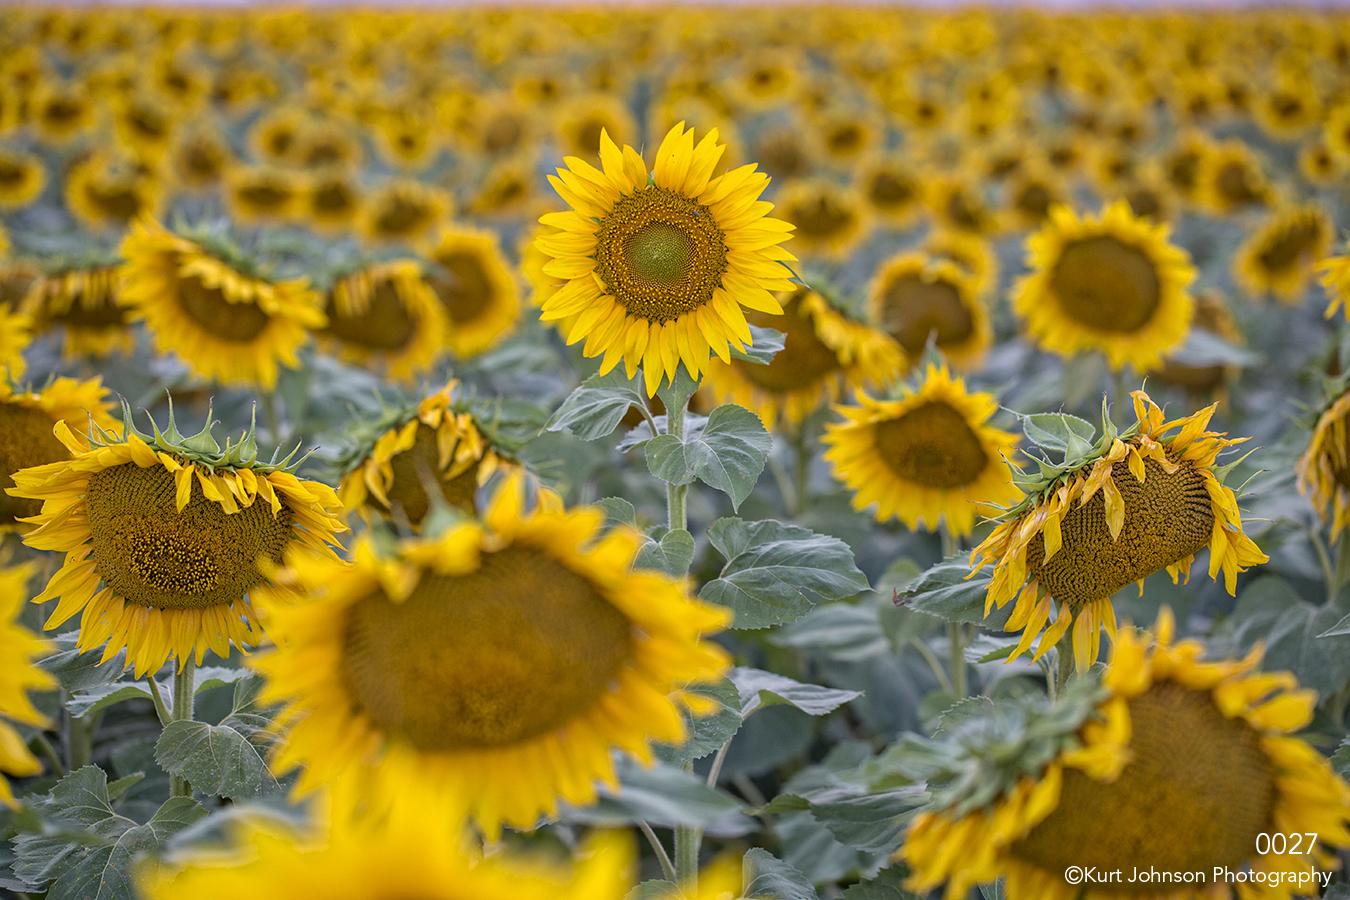 flowers sunflowers field yellow